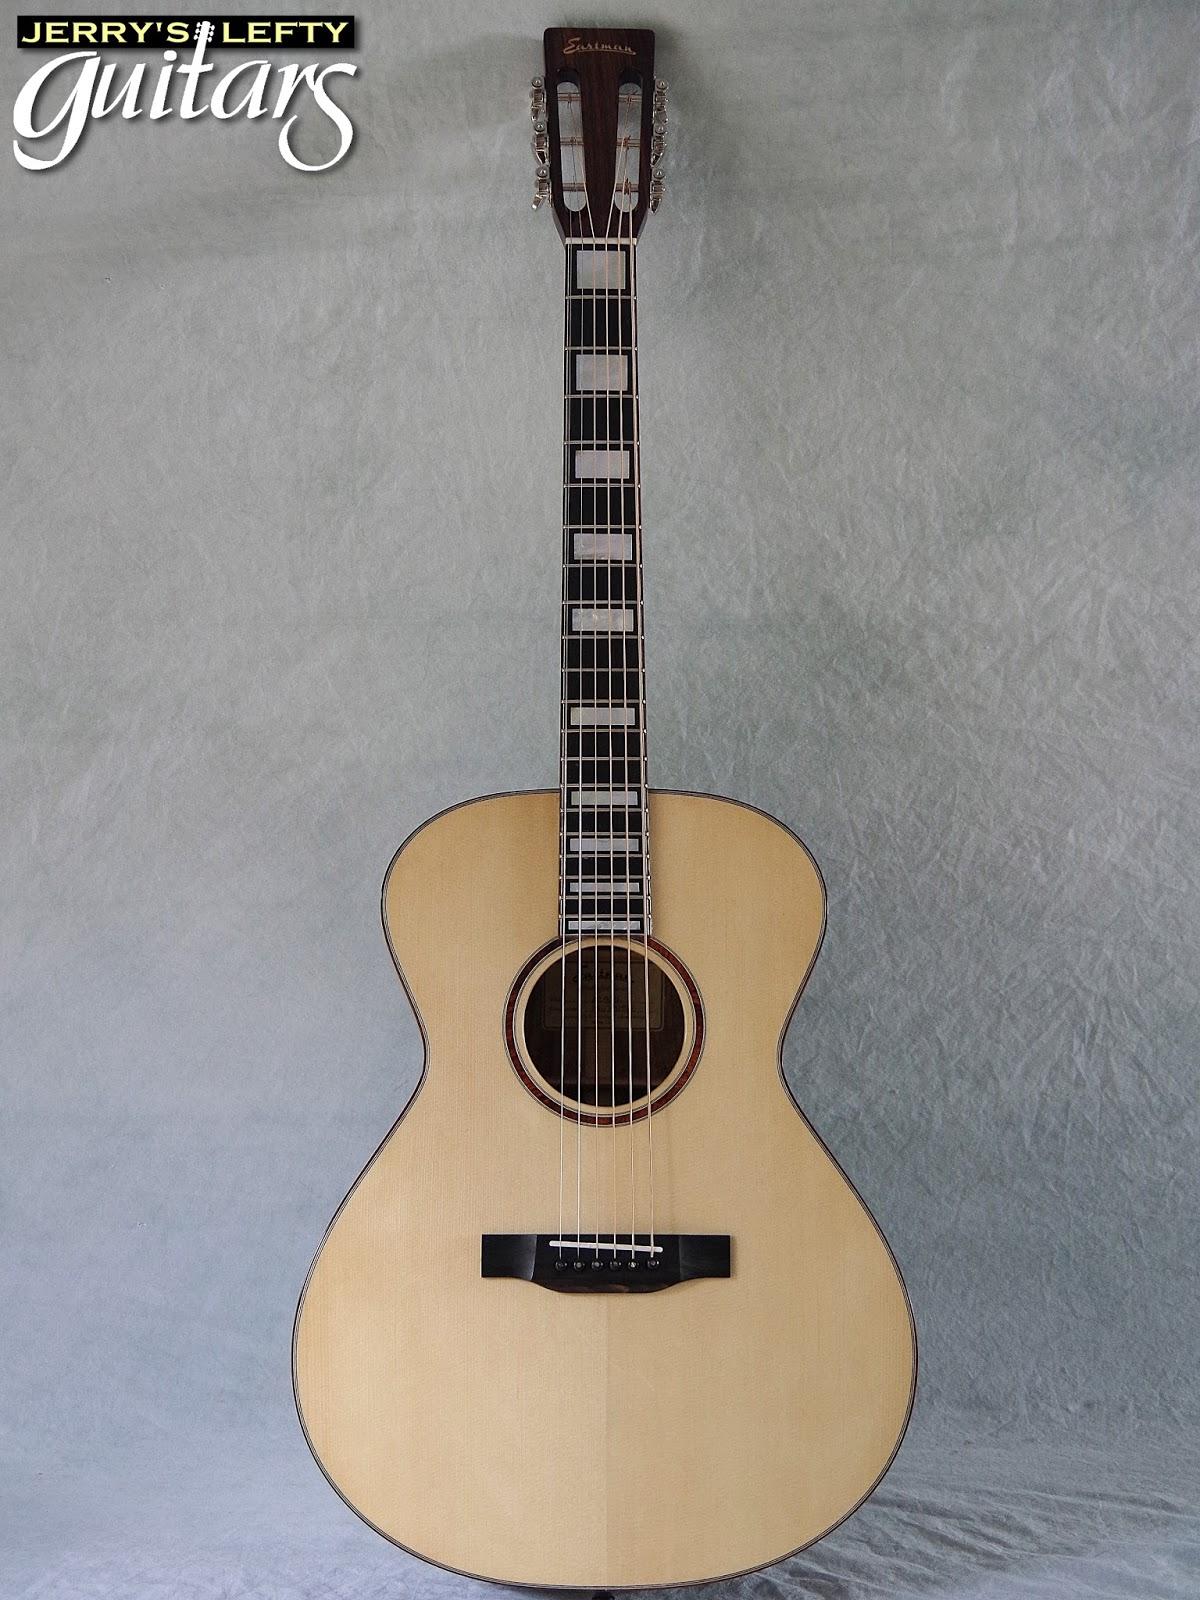 jerry 39 s lefty guitars newest guitar arrivals updated weekly eastman ac508 custom left handed. Black Bedroom Furniture Sets. Home Design Ideas